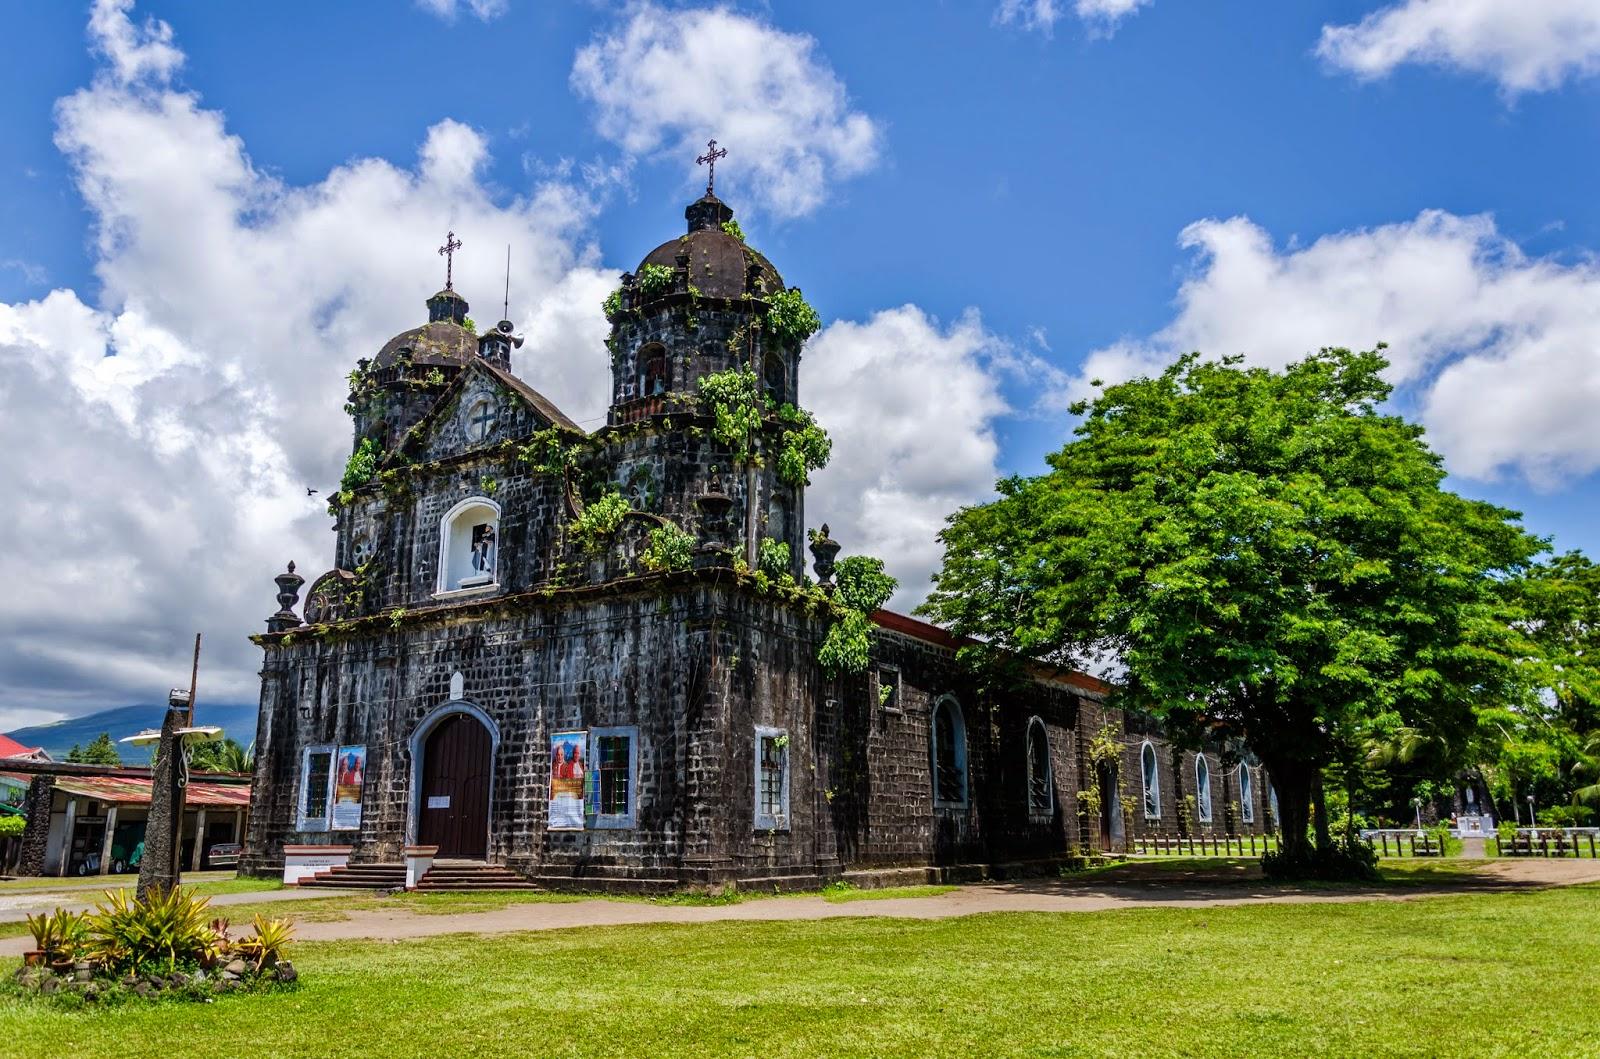 Santo Domingo (Albay) Philippines  city pictures gallery : The Wayward Wanderer: Philippines Day 17: Albay Santo Domingo, Busay ...